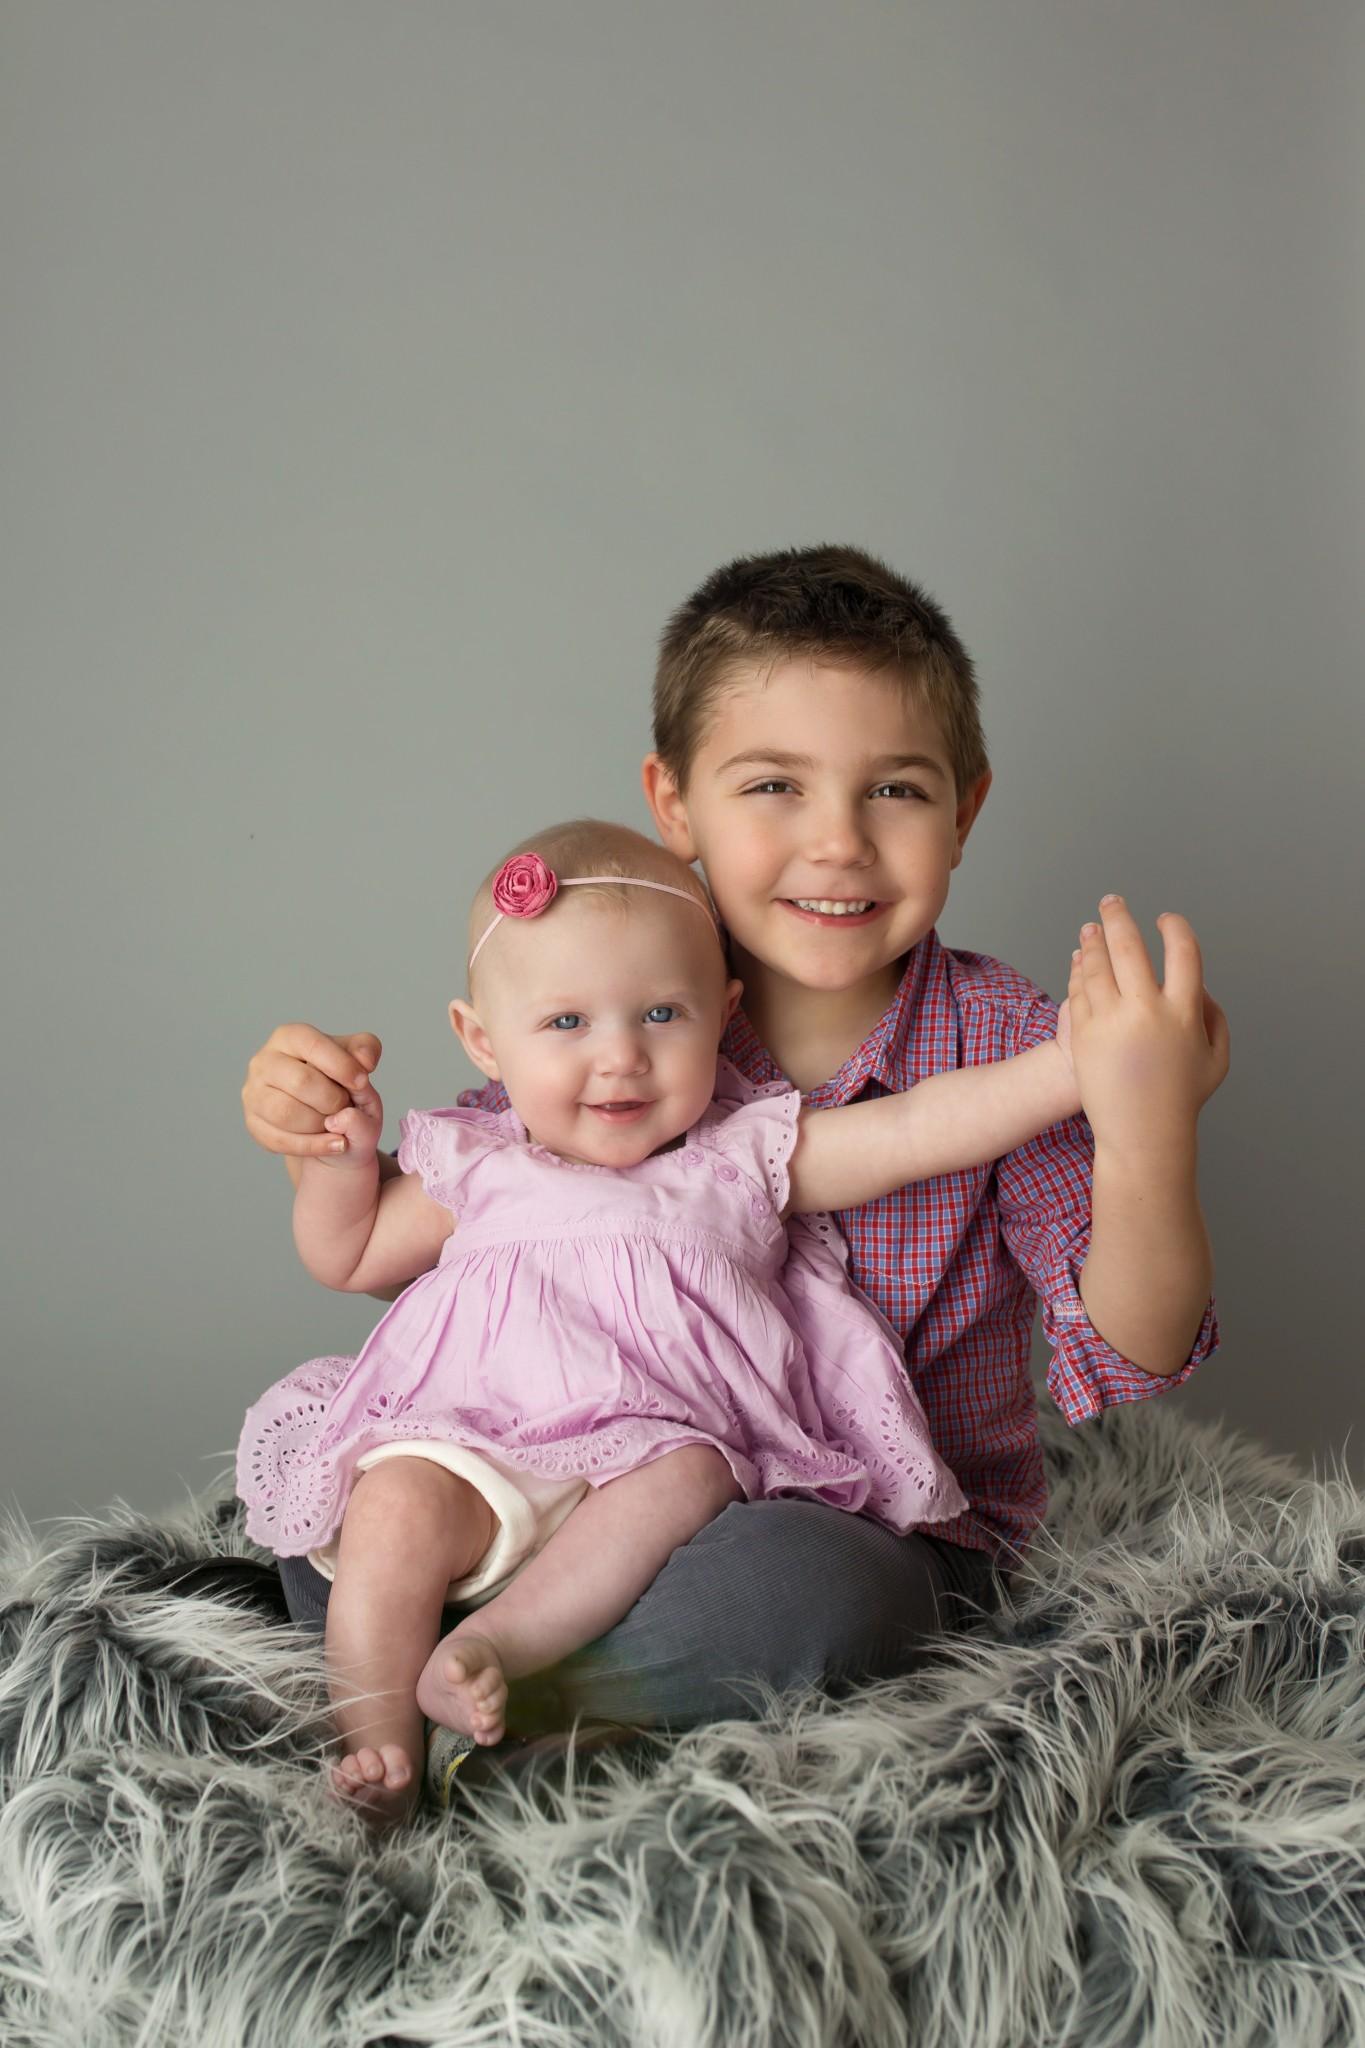 Sibling portrait session